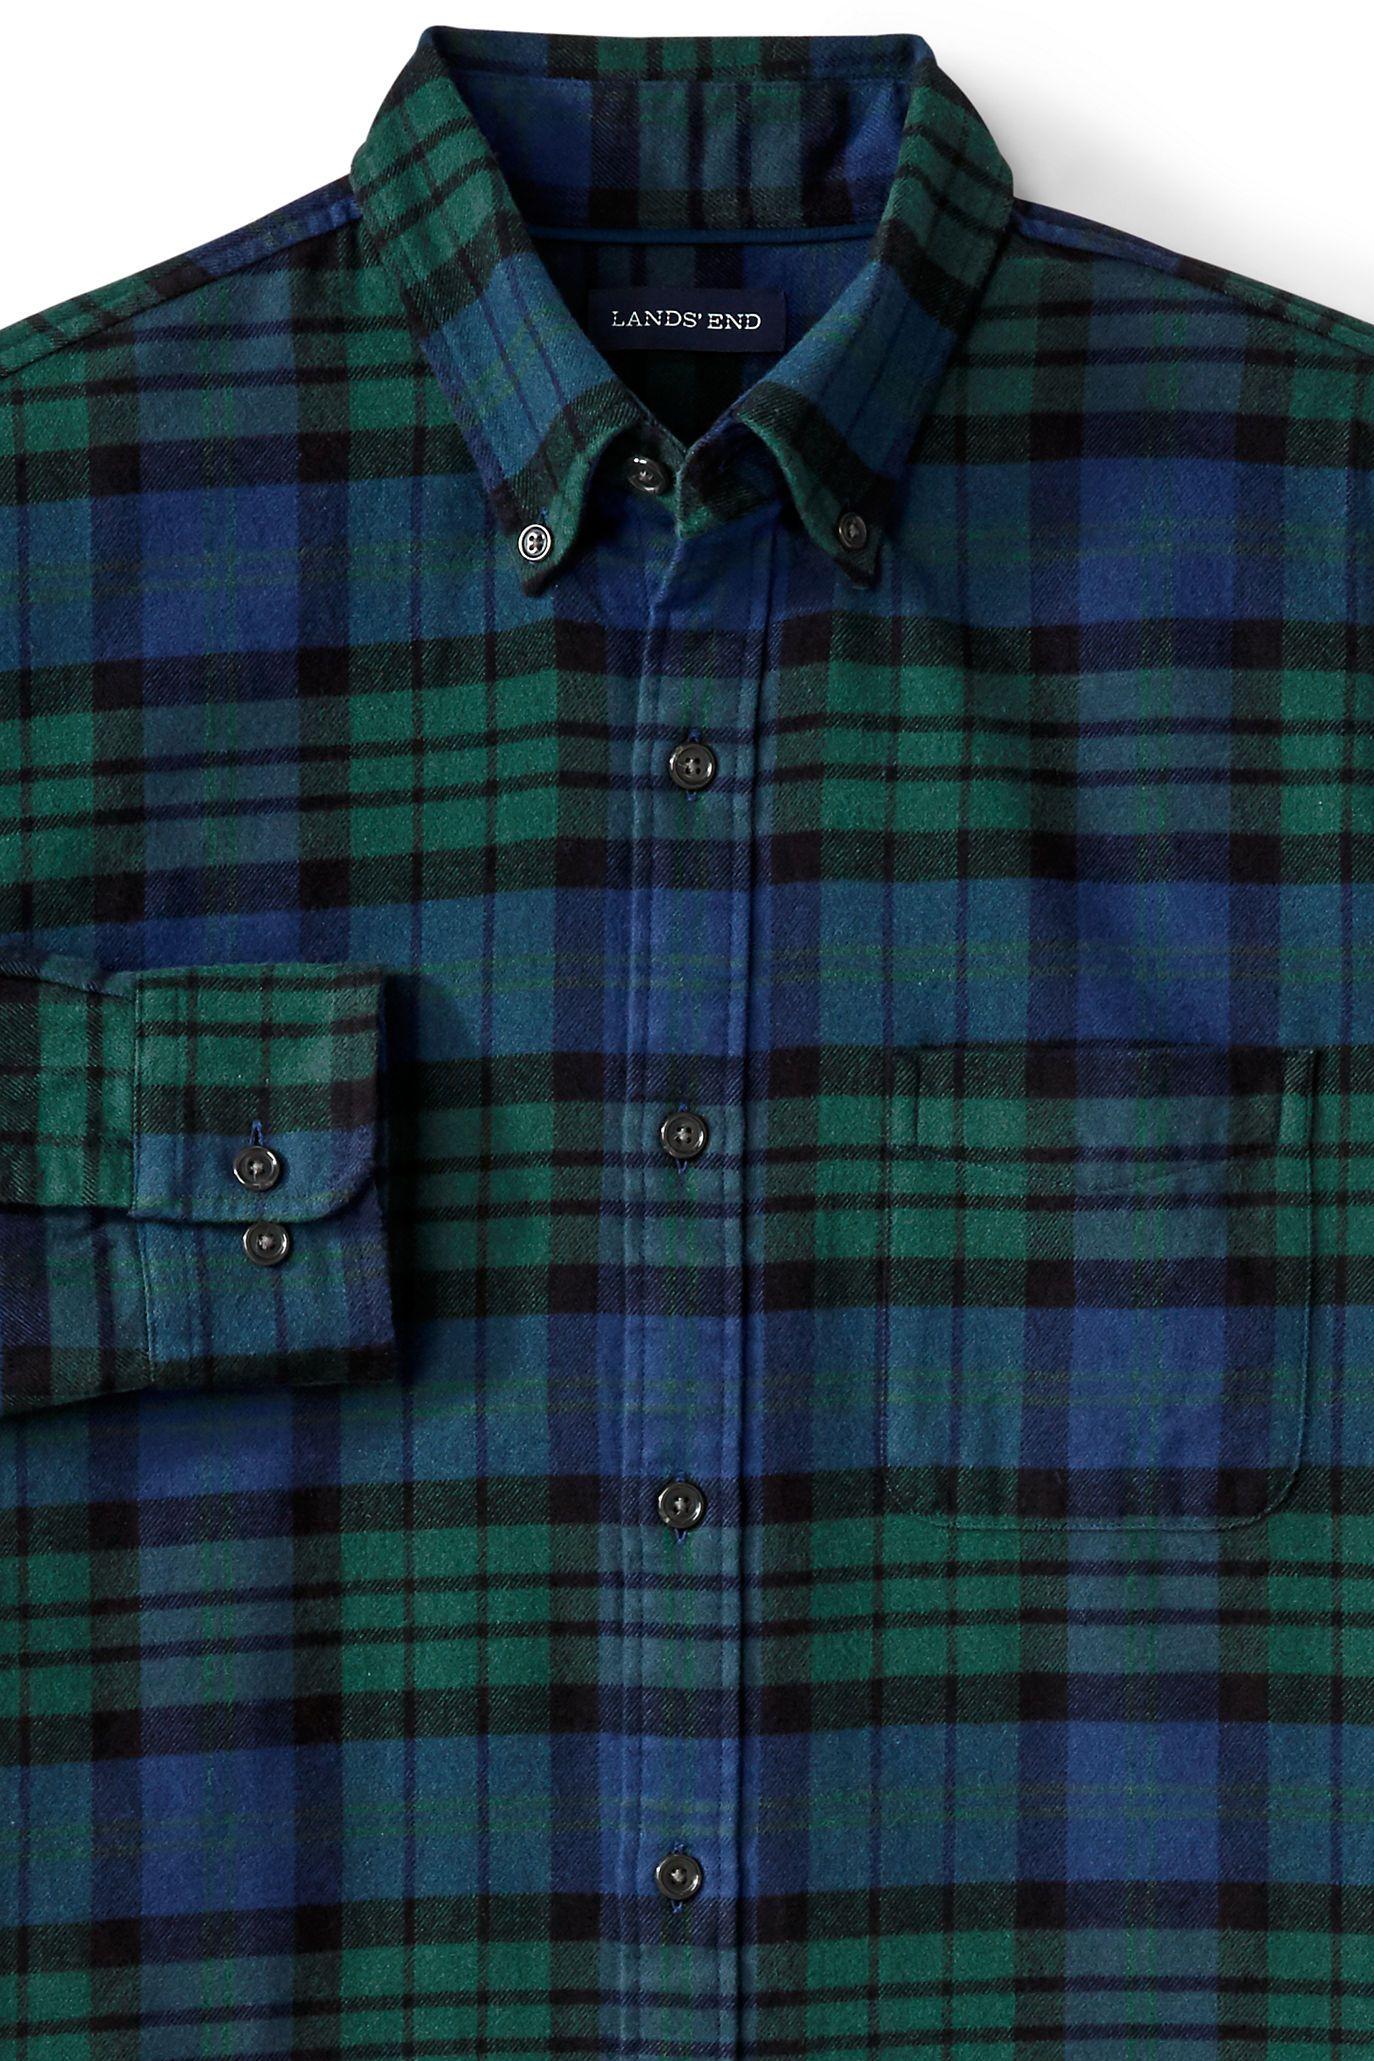 b1ca61a97 Lands' End Flagship Flannel—Blackwatch Tartan | Style | Casual ...